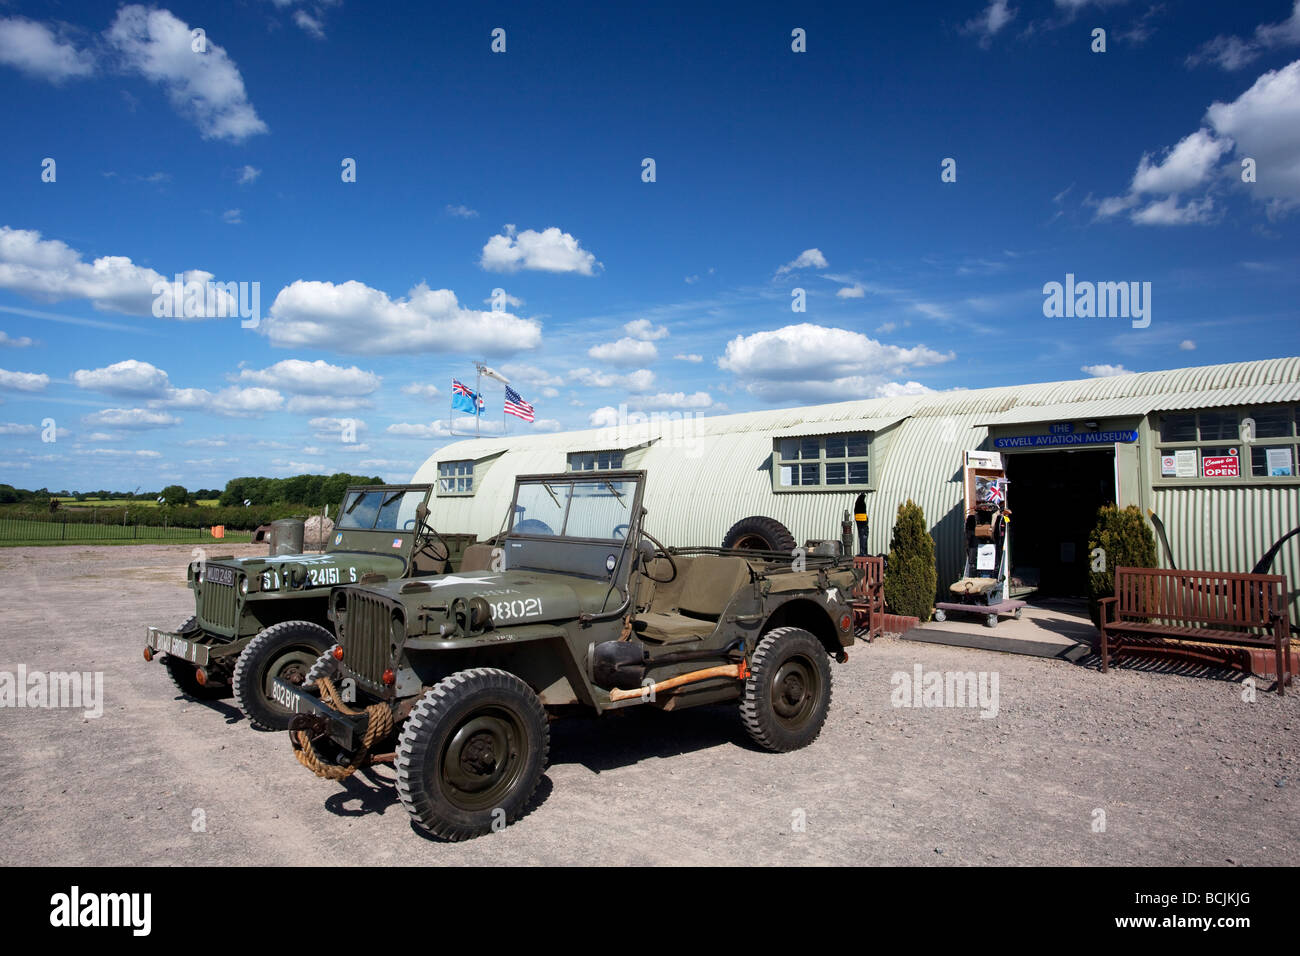 Sywell Aviation Museum, Sywell, Northamptonshire, England, UK - Stock Image